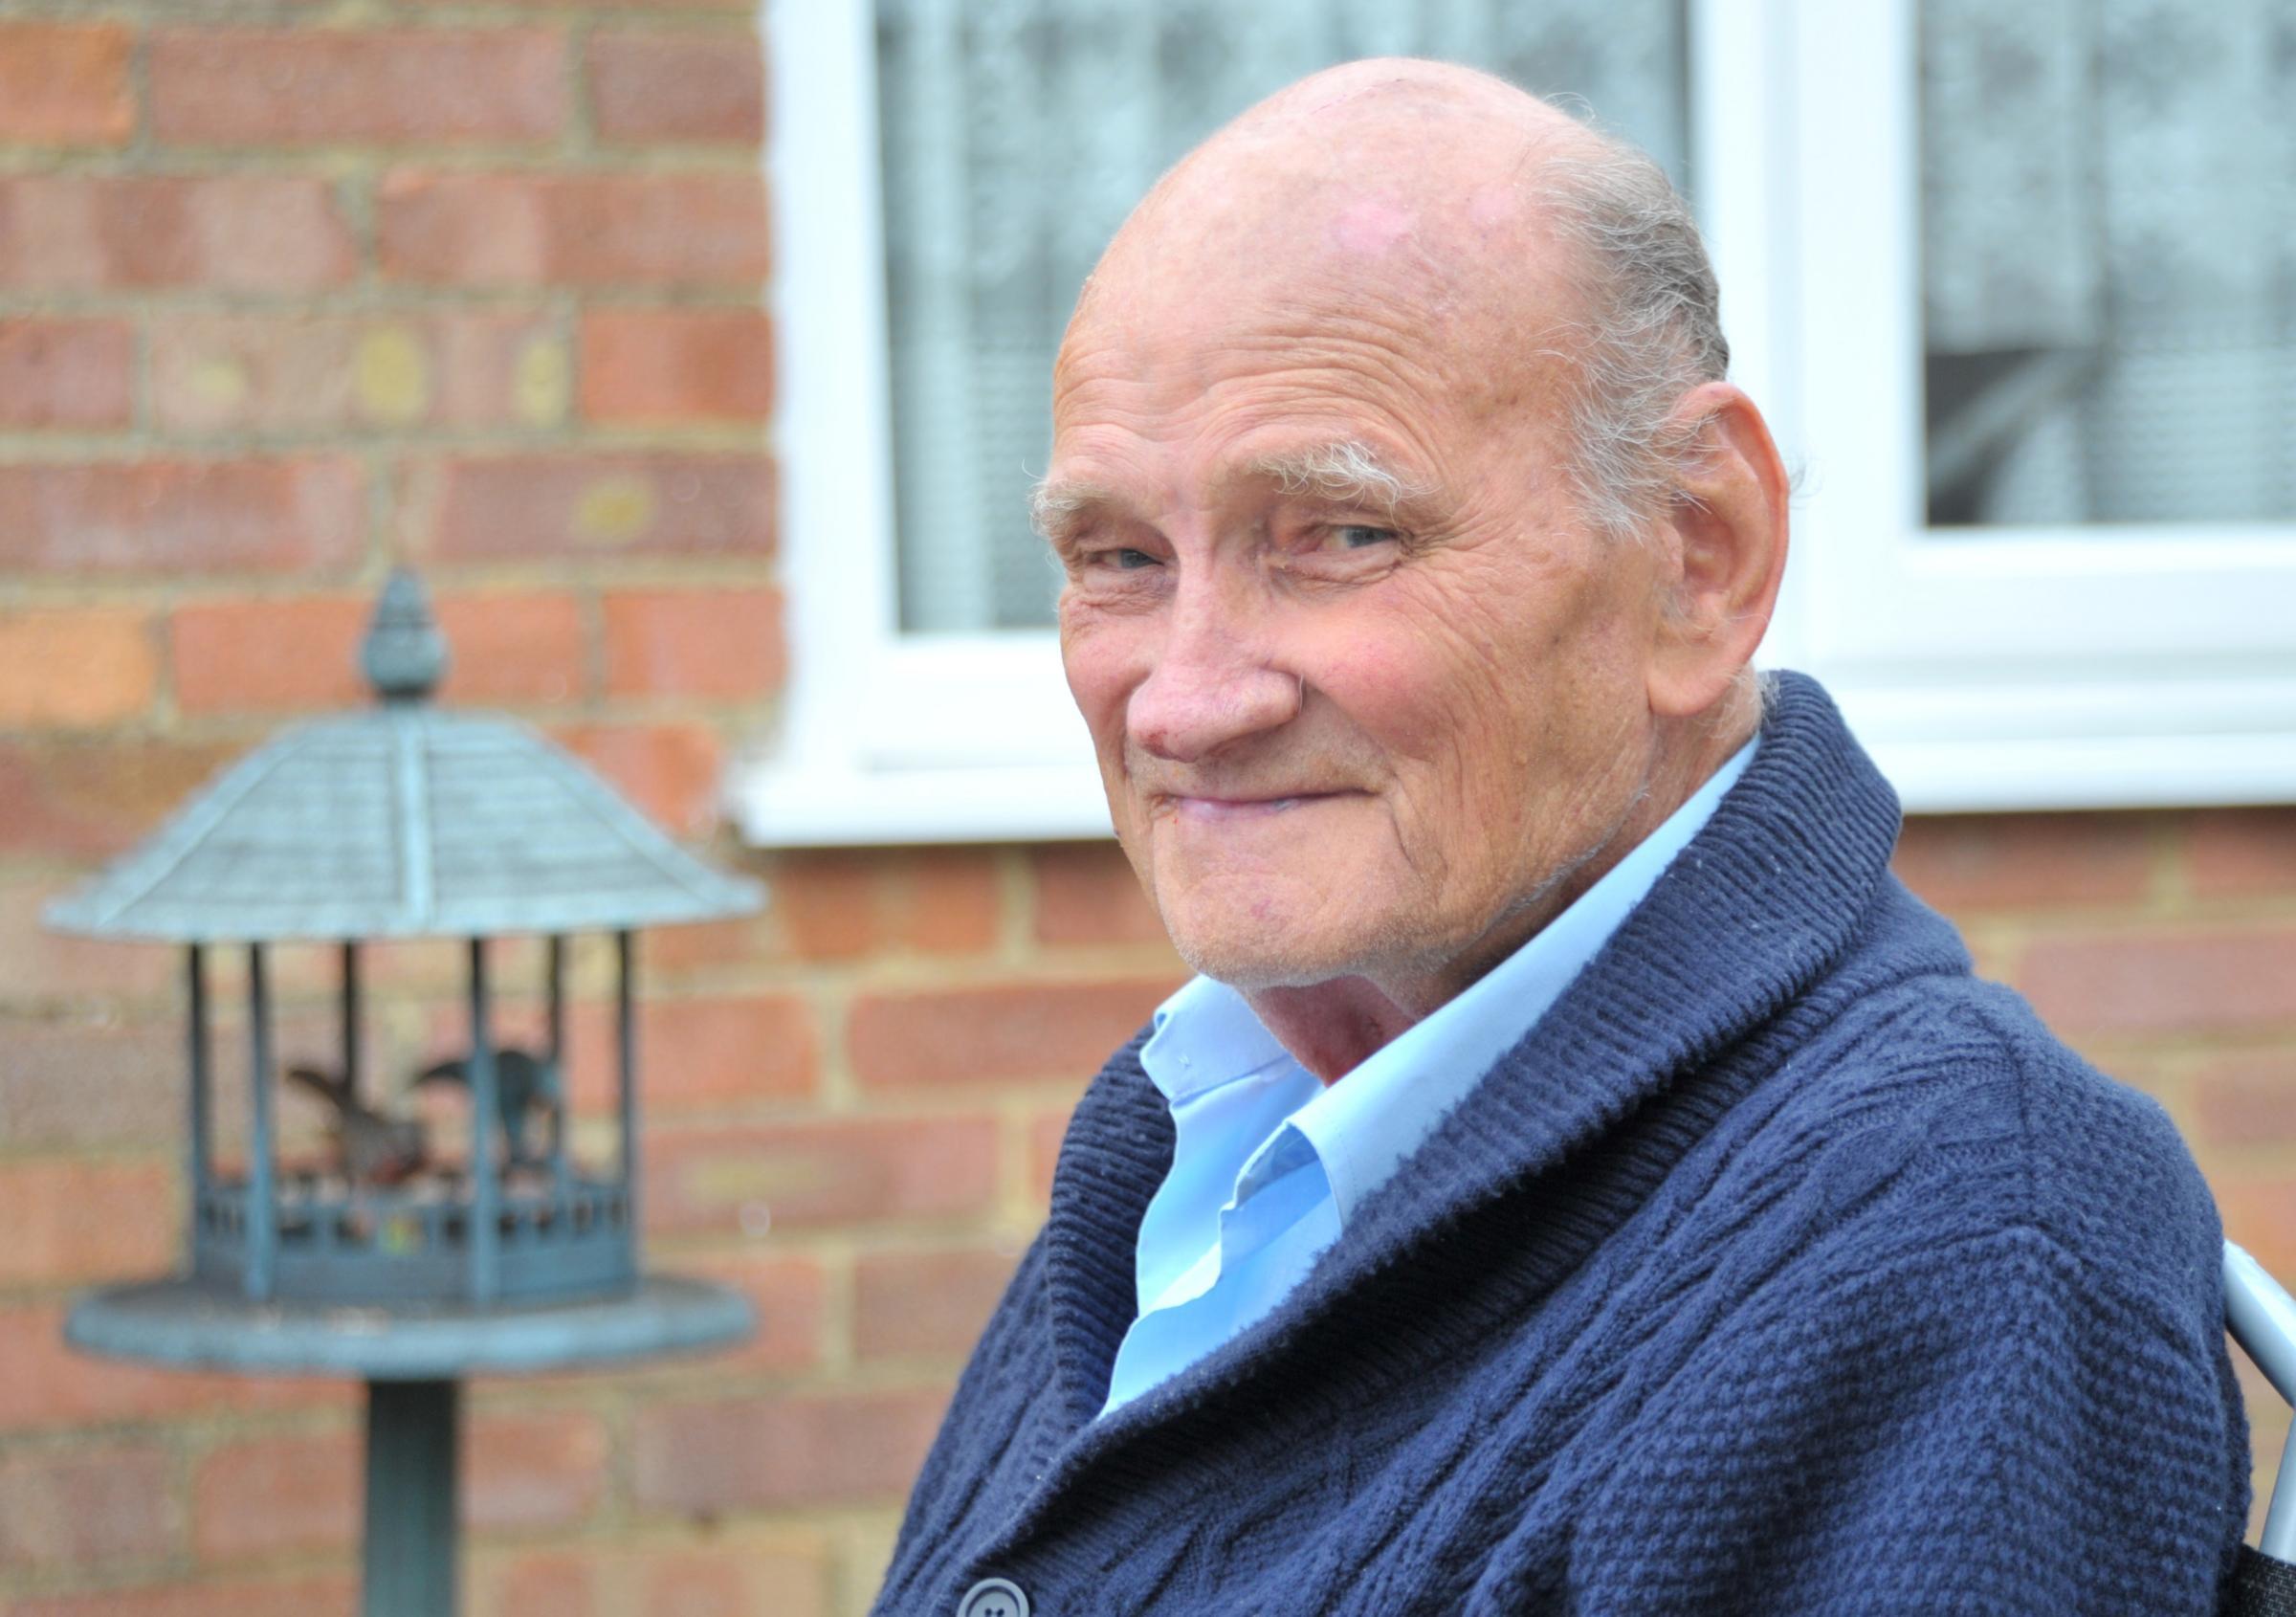 Veteran Jim thanks NHS for saving his life after heart failure